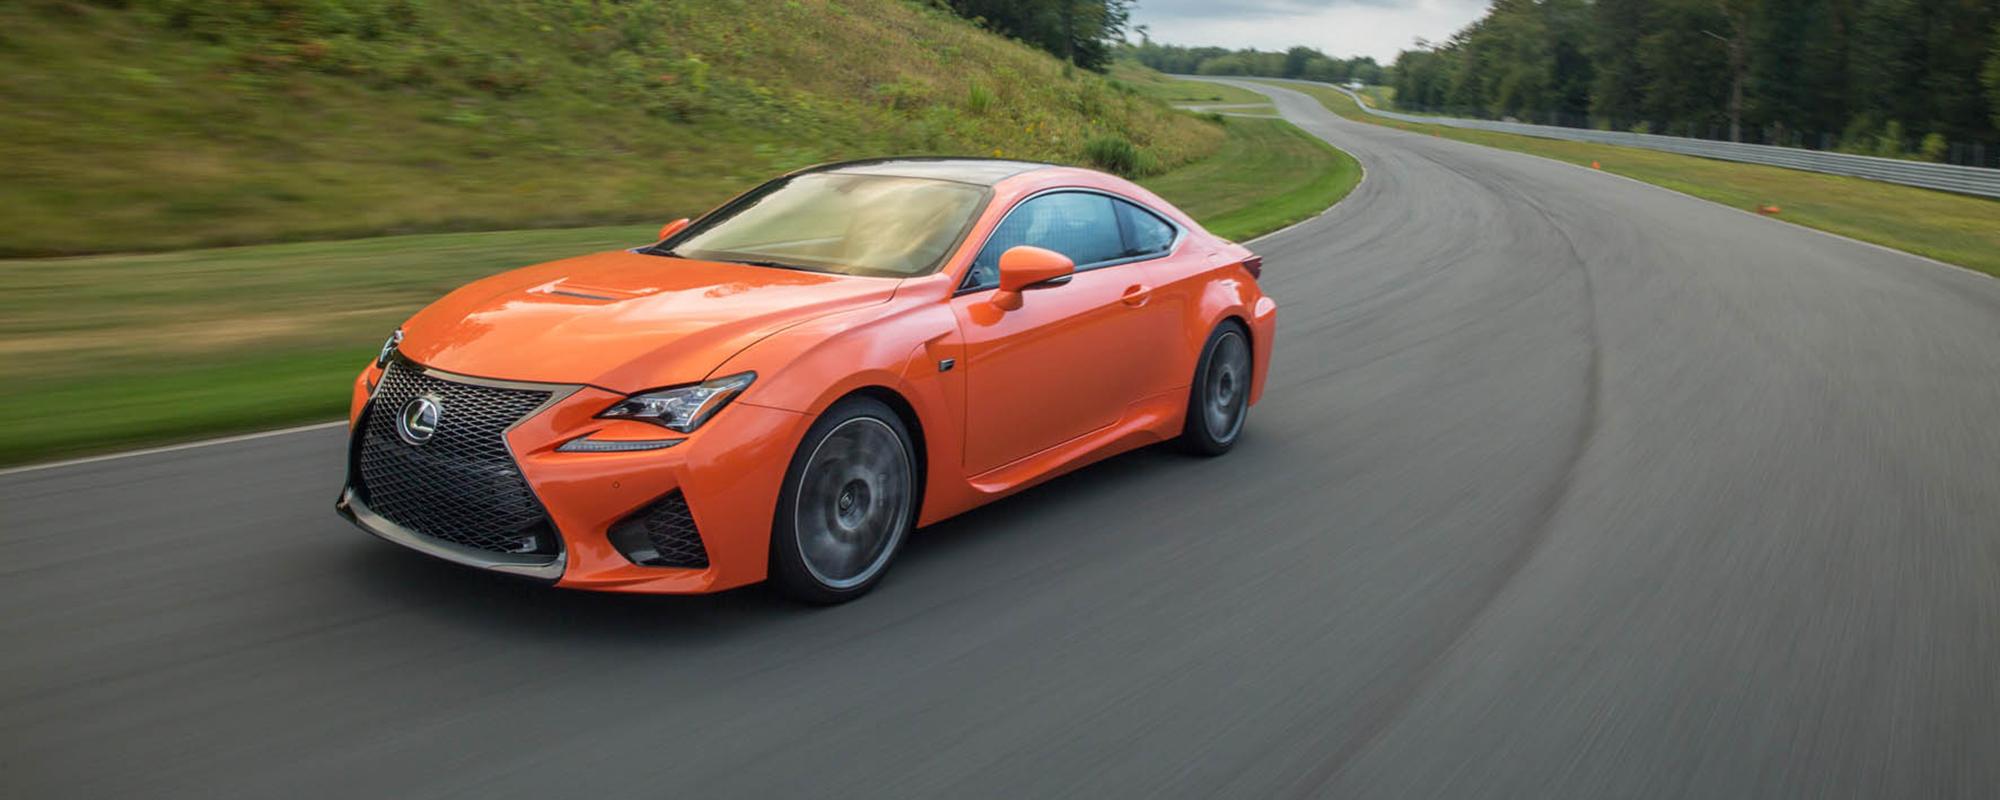 Lexus RC F: hoogwaardige techniek en potente prestaties